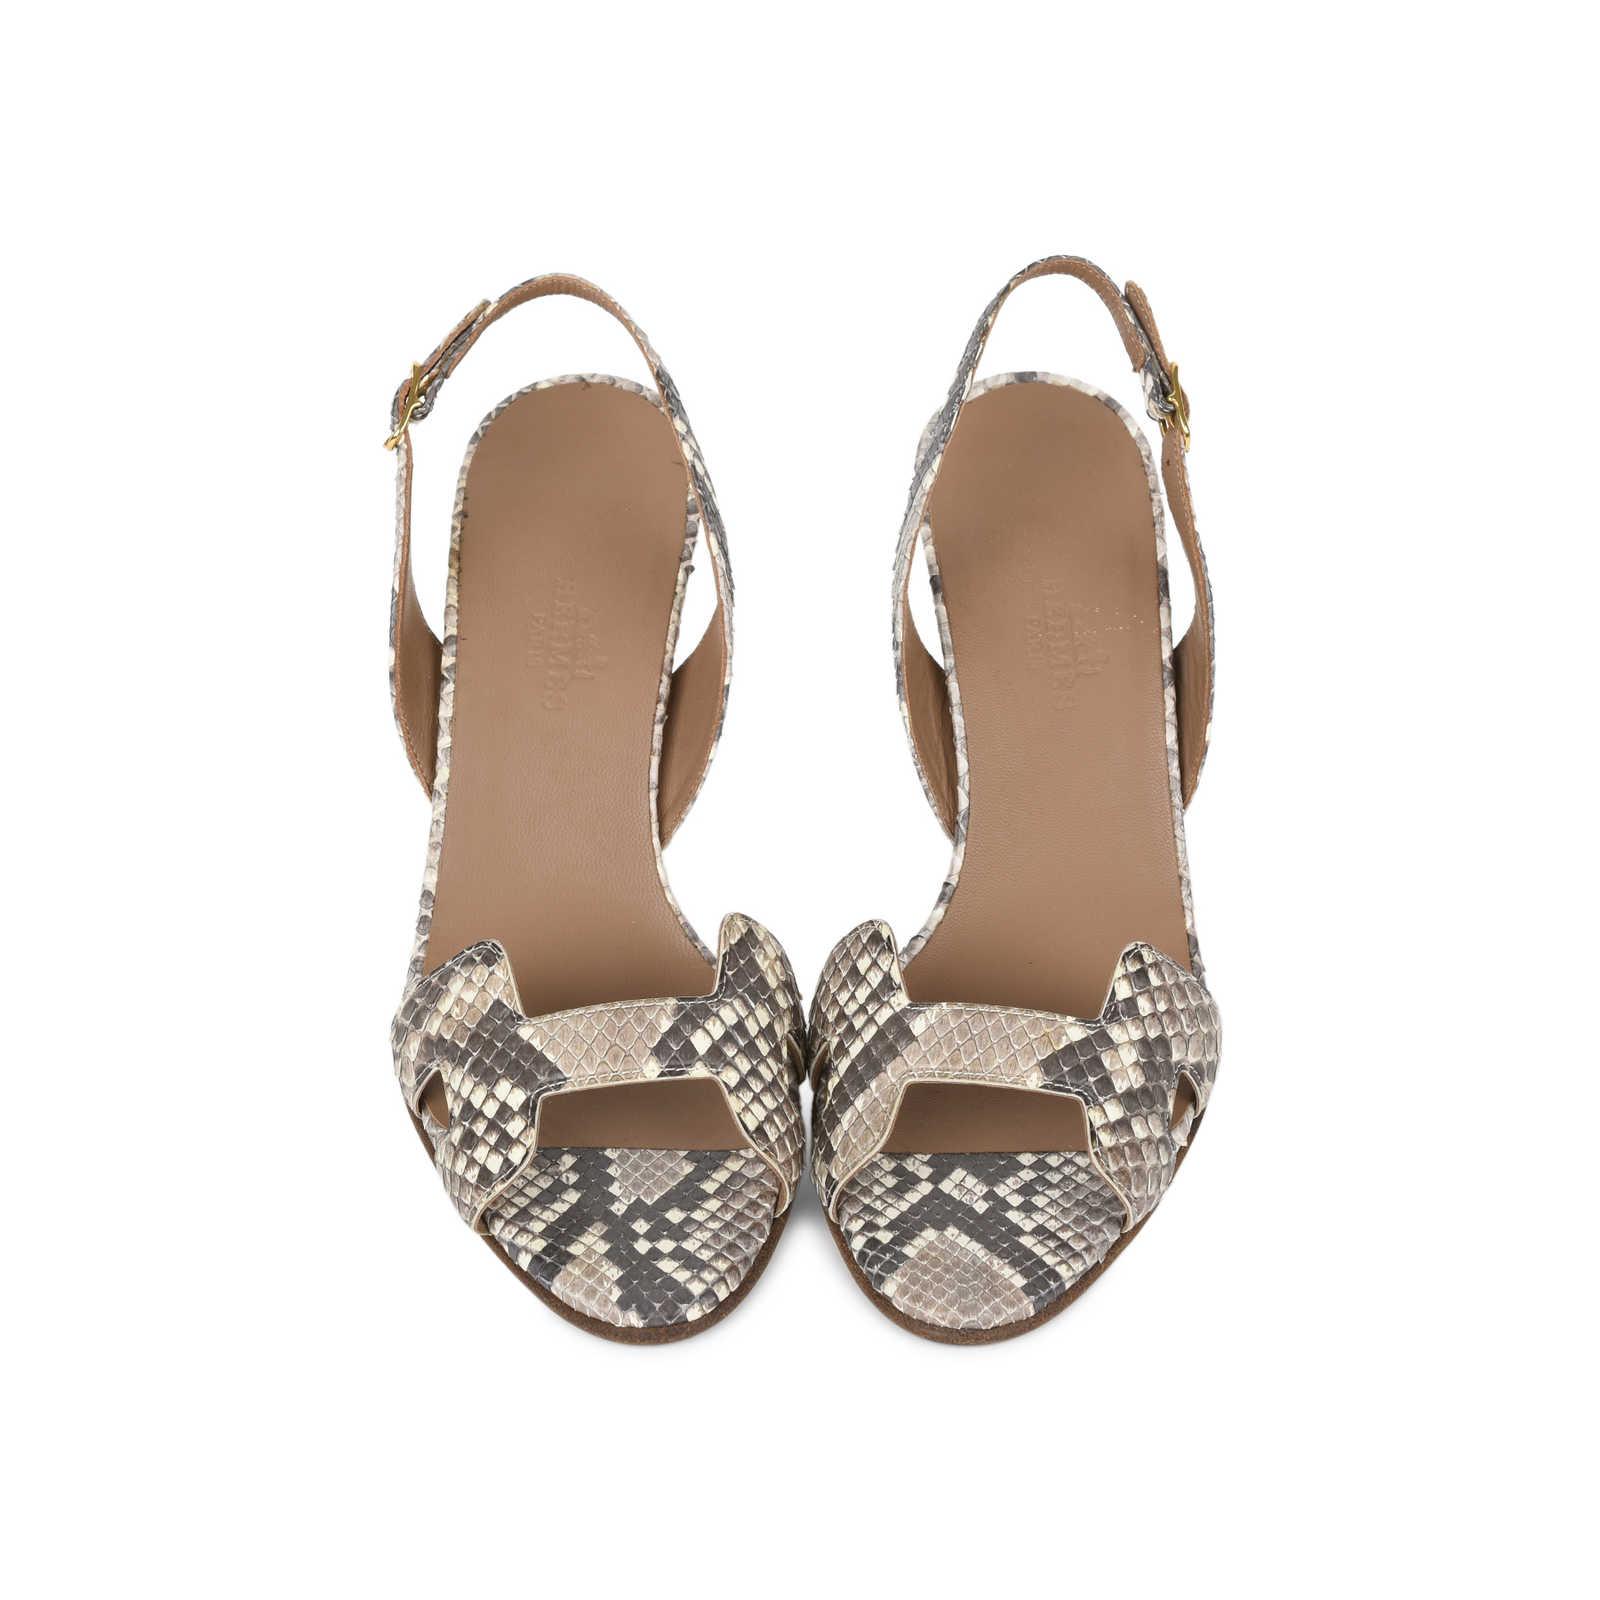 eb7acaedae9 Authentic Second Hand Hermès Python Night 70 Sandals (PSS-515-00001 ...